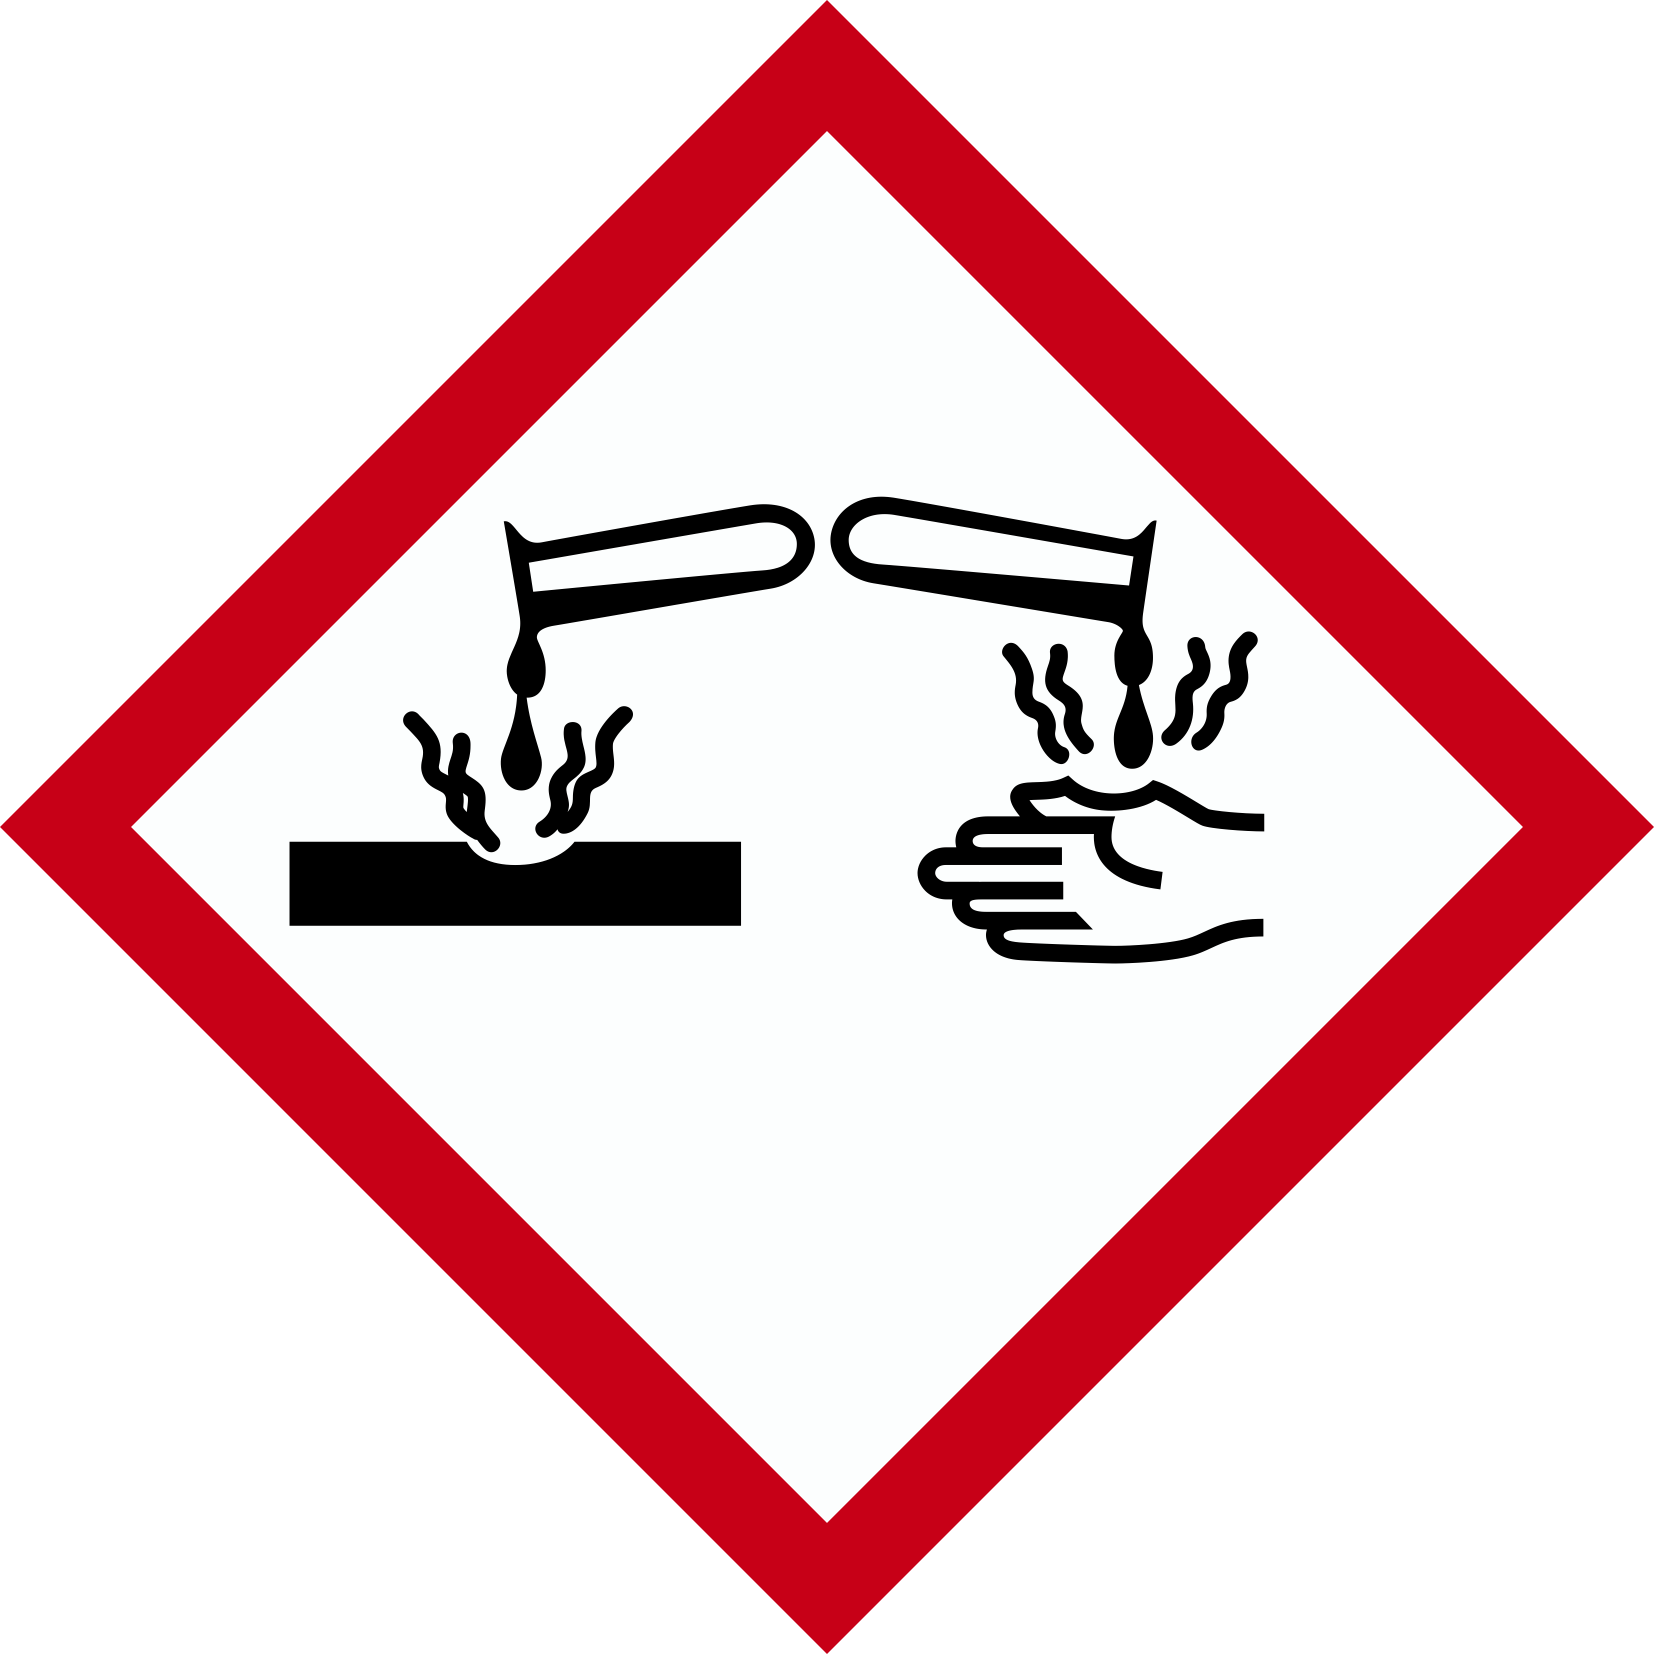 GHS Pictogram Icon Corrosive Pictogram, Health symbol